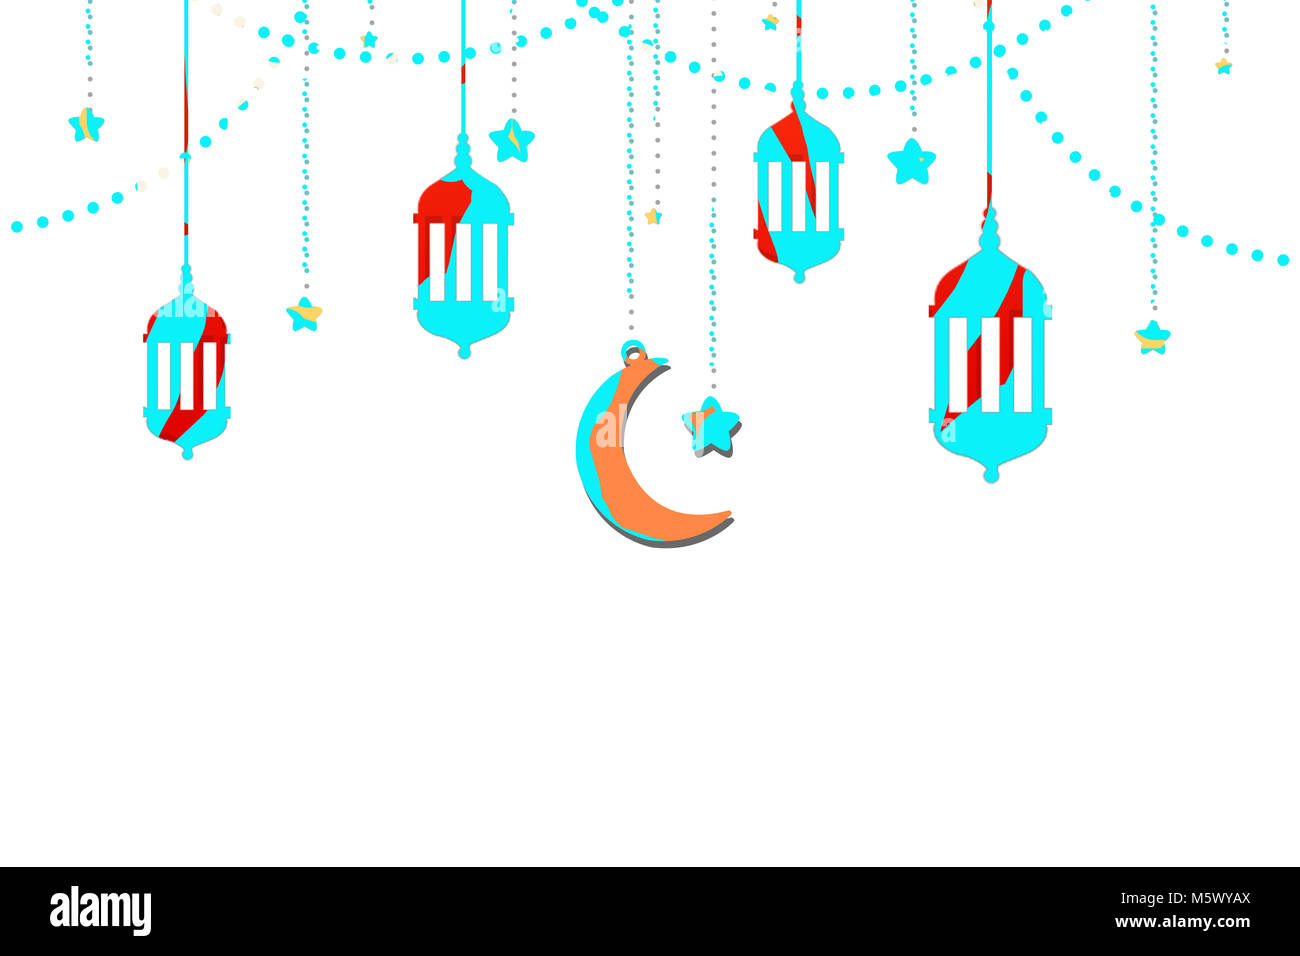 Illustration Of Eid Mubarak Islamic Holiday Greeting Card Design